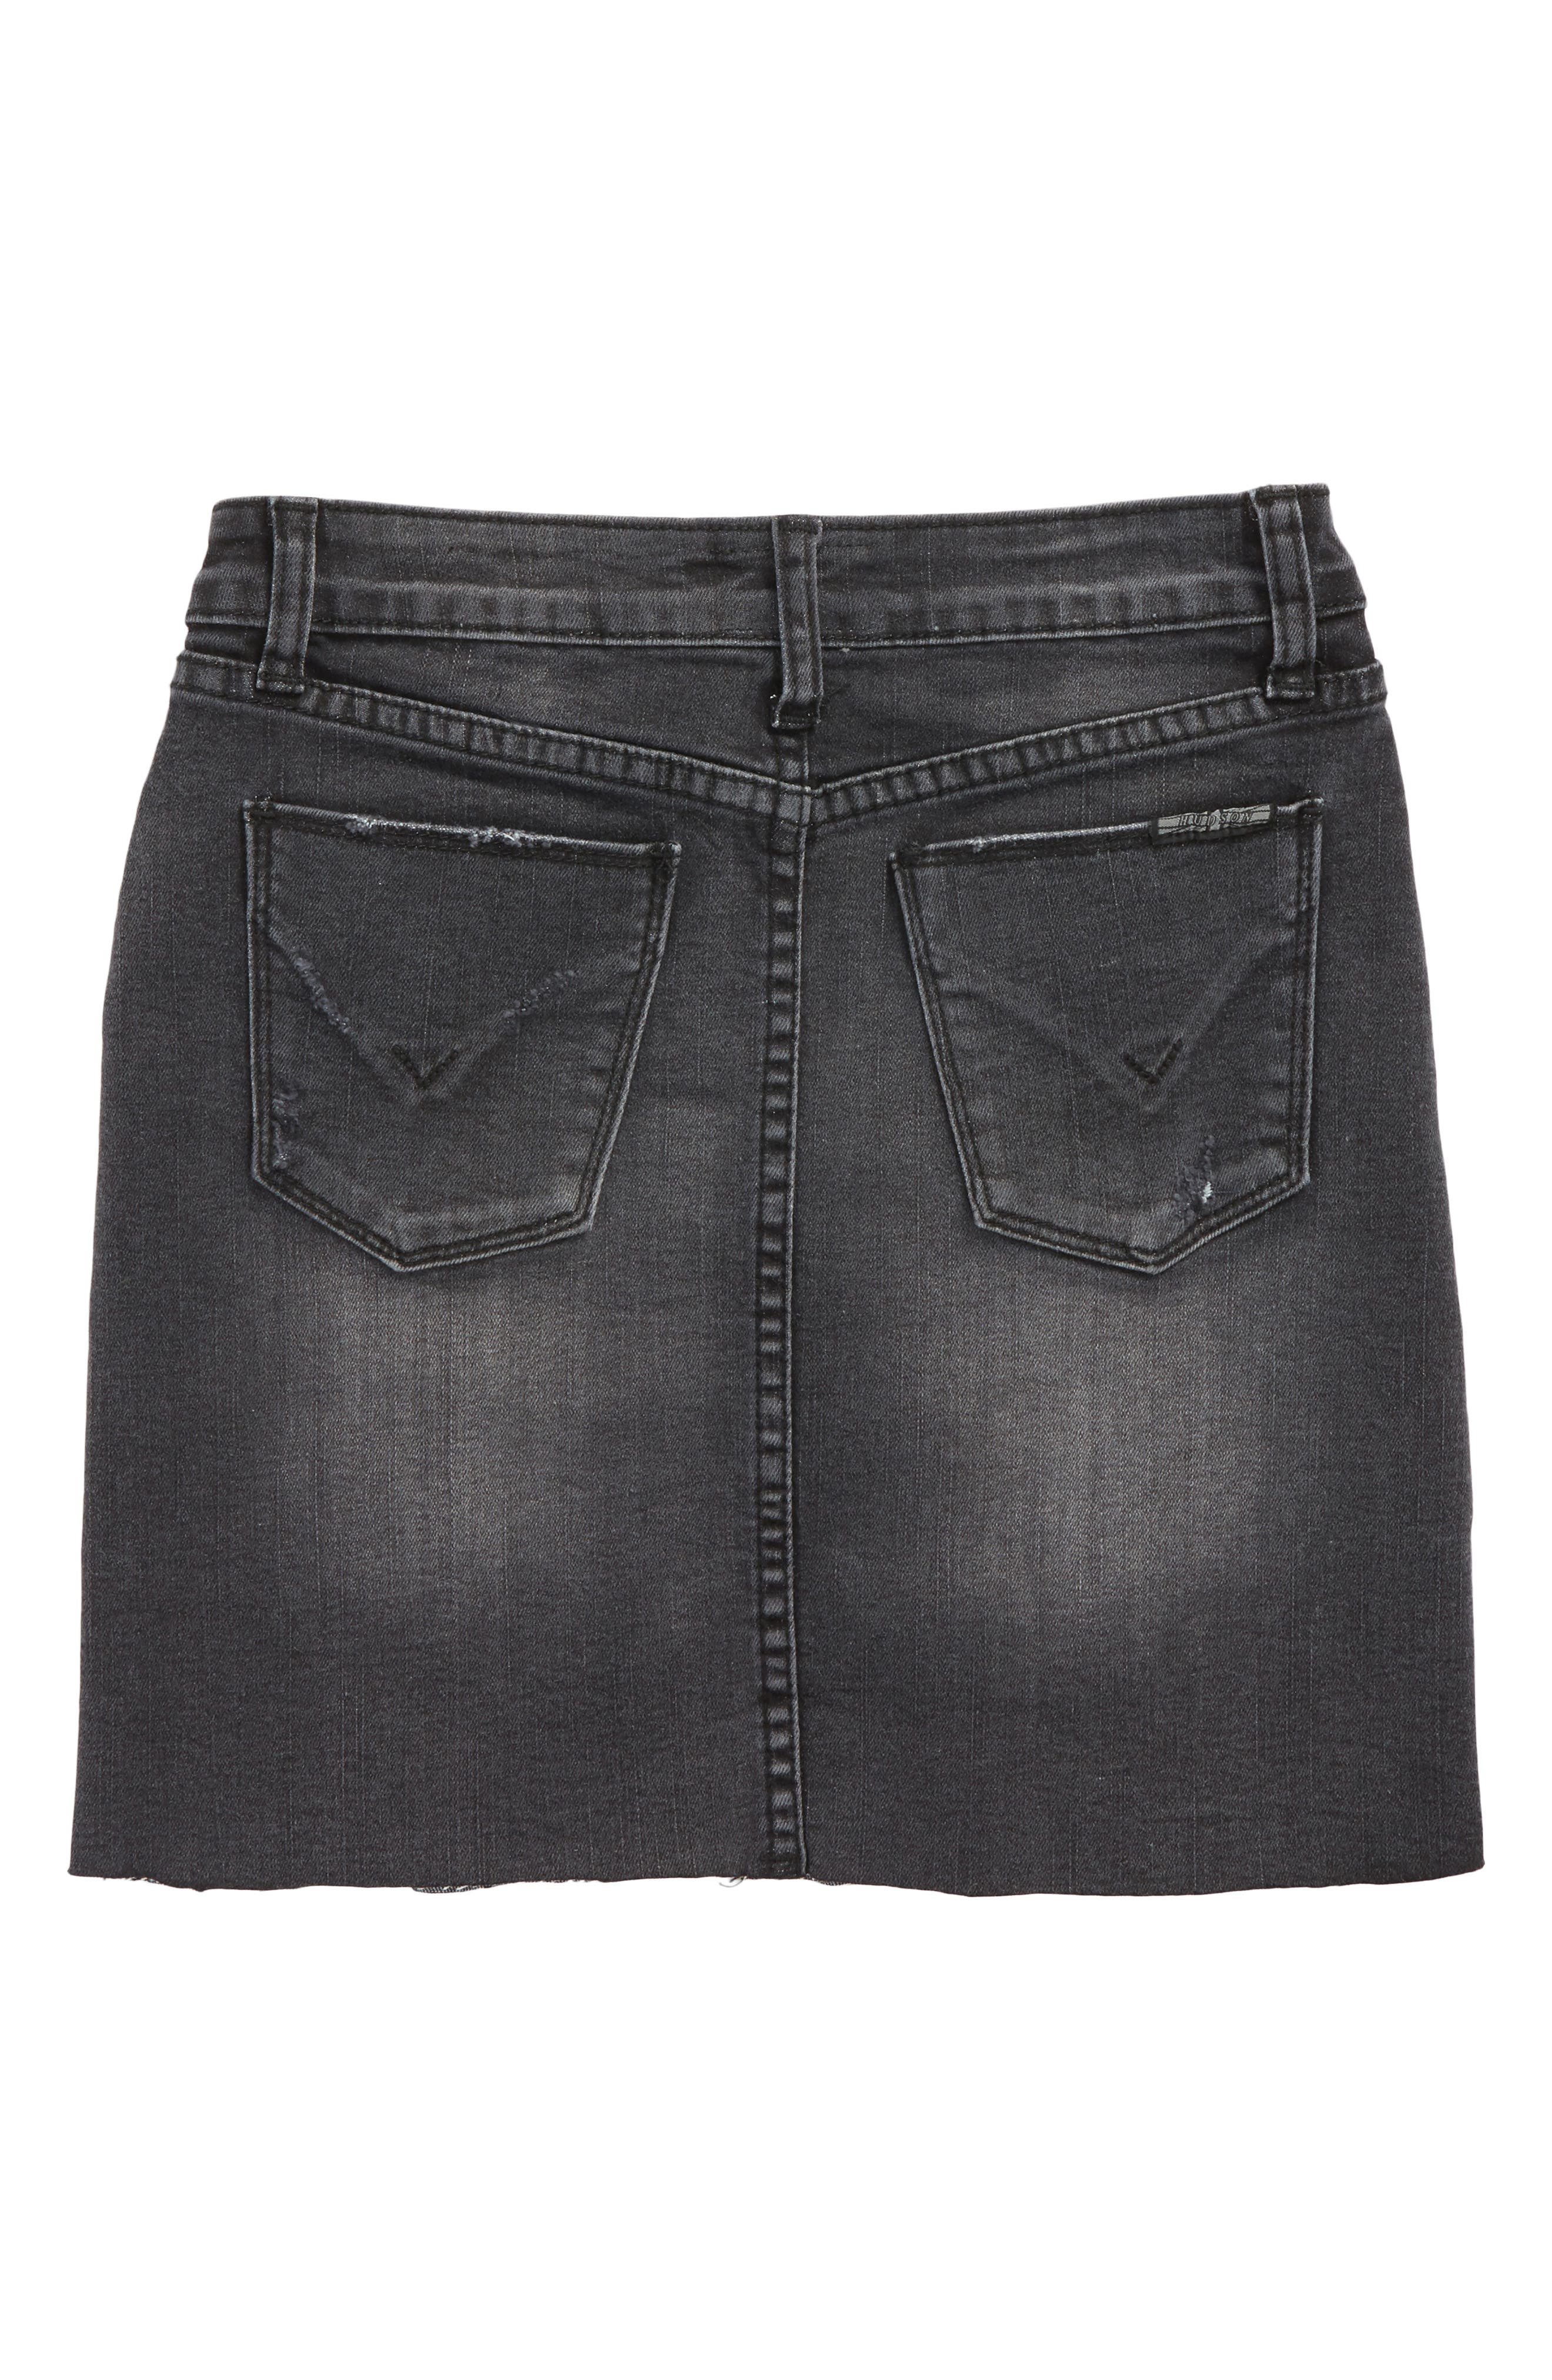 Tara Cutoff Denim Skirt,                             Alternate thumbnail 2, color,                             001